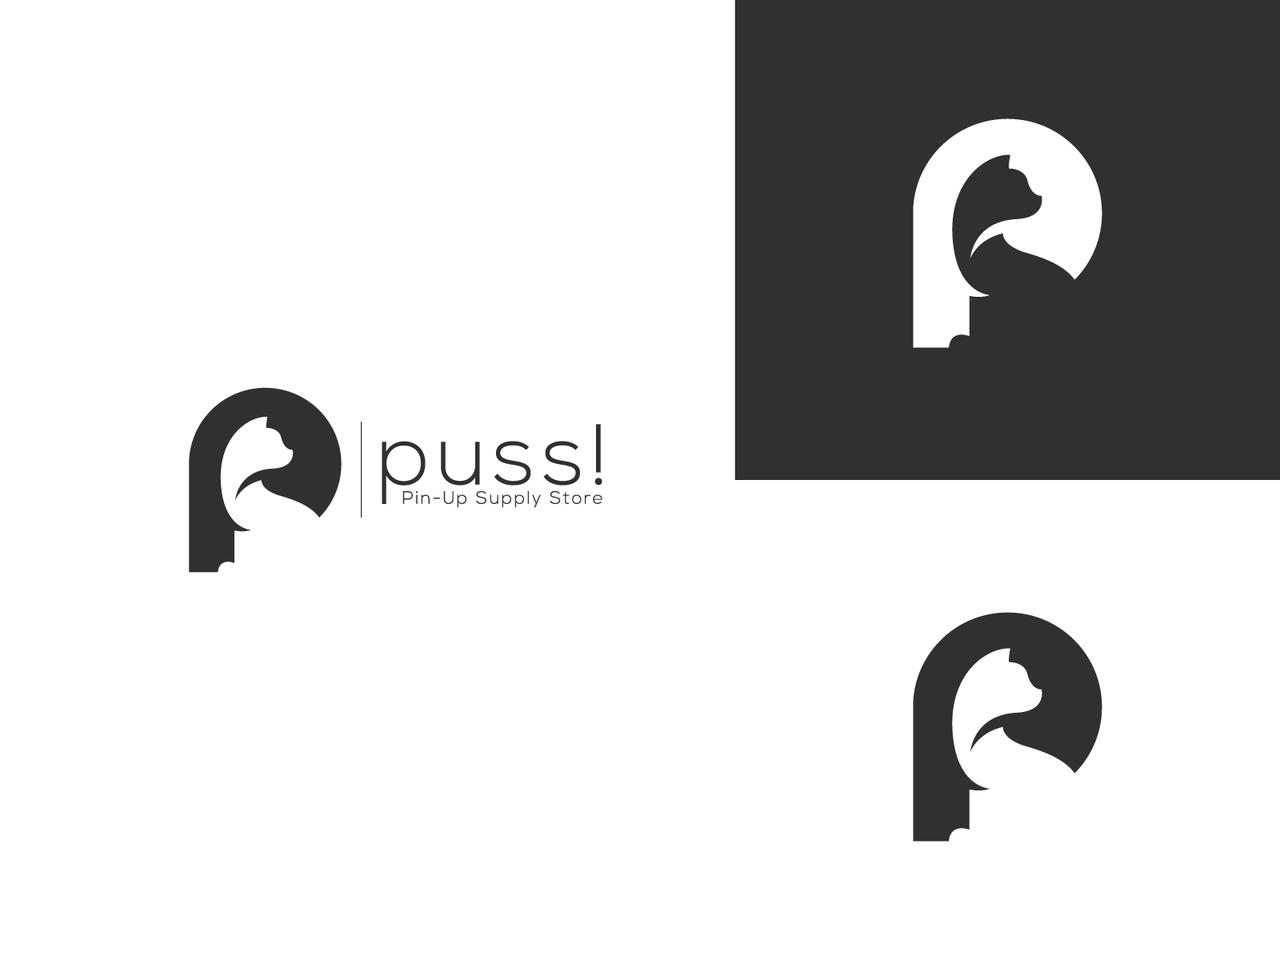 Cat logo design using negative space